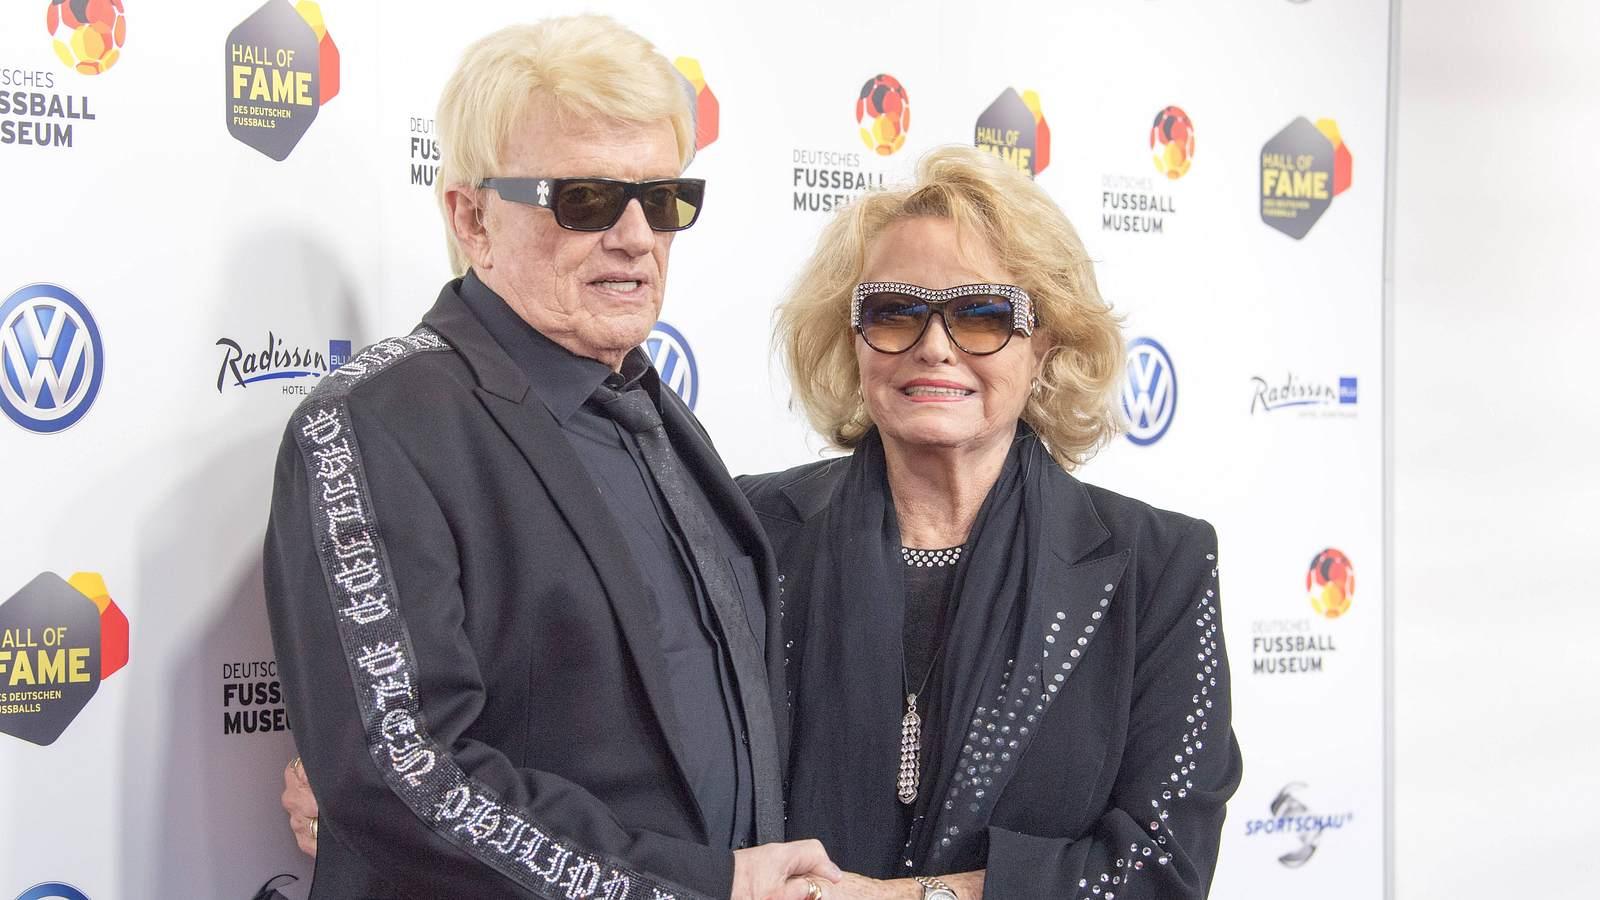 Heino & Hannelore: Bitteres Drama nach 41 Ehe-Jahren!